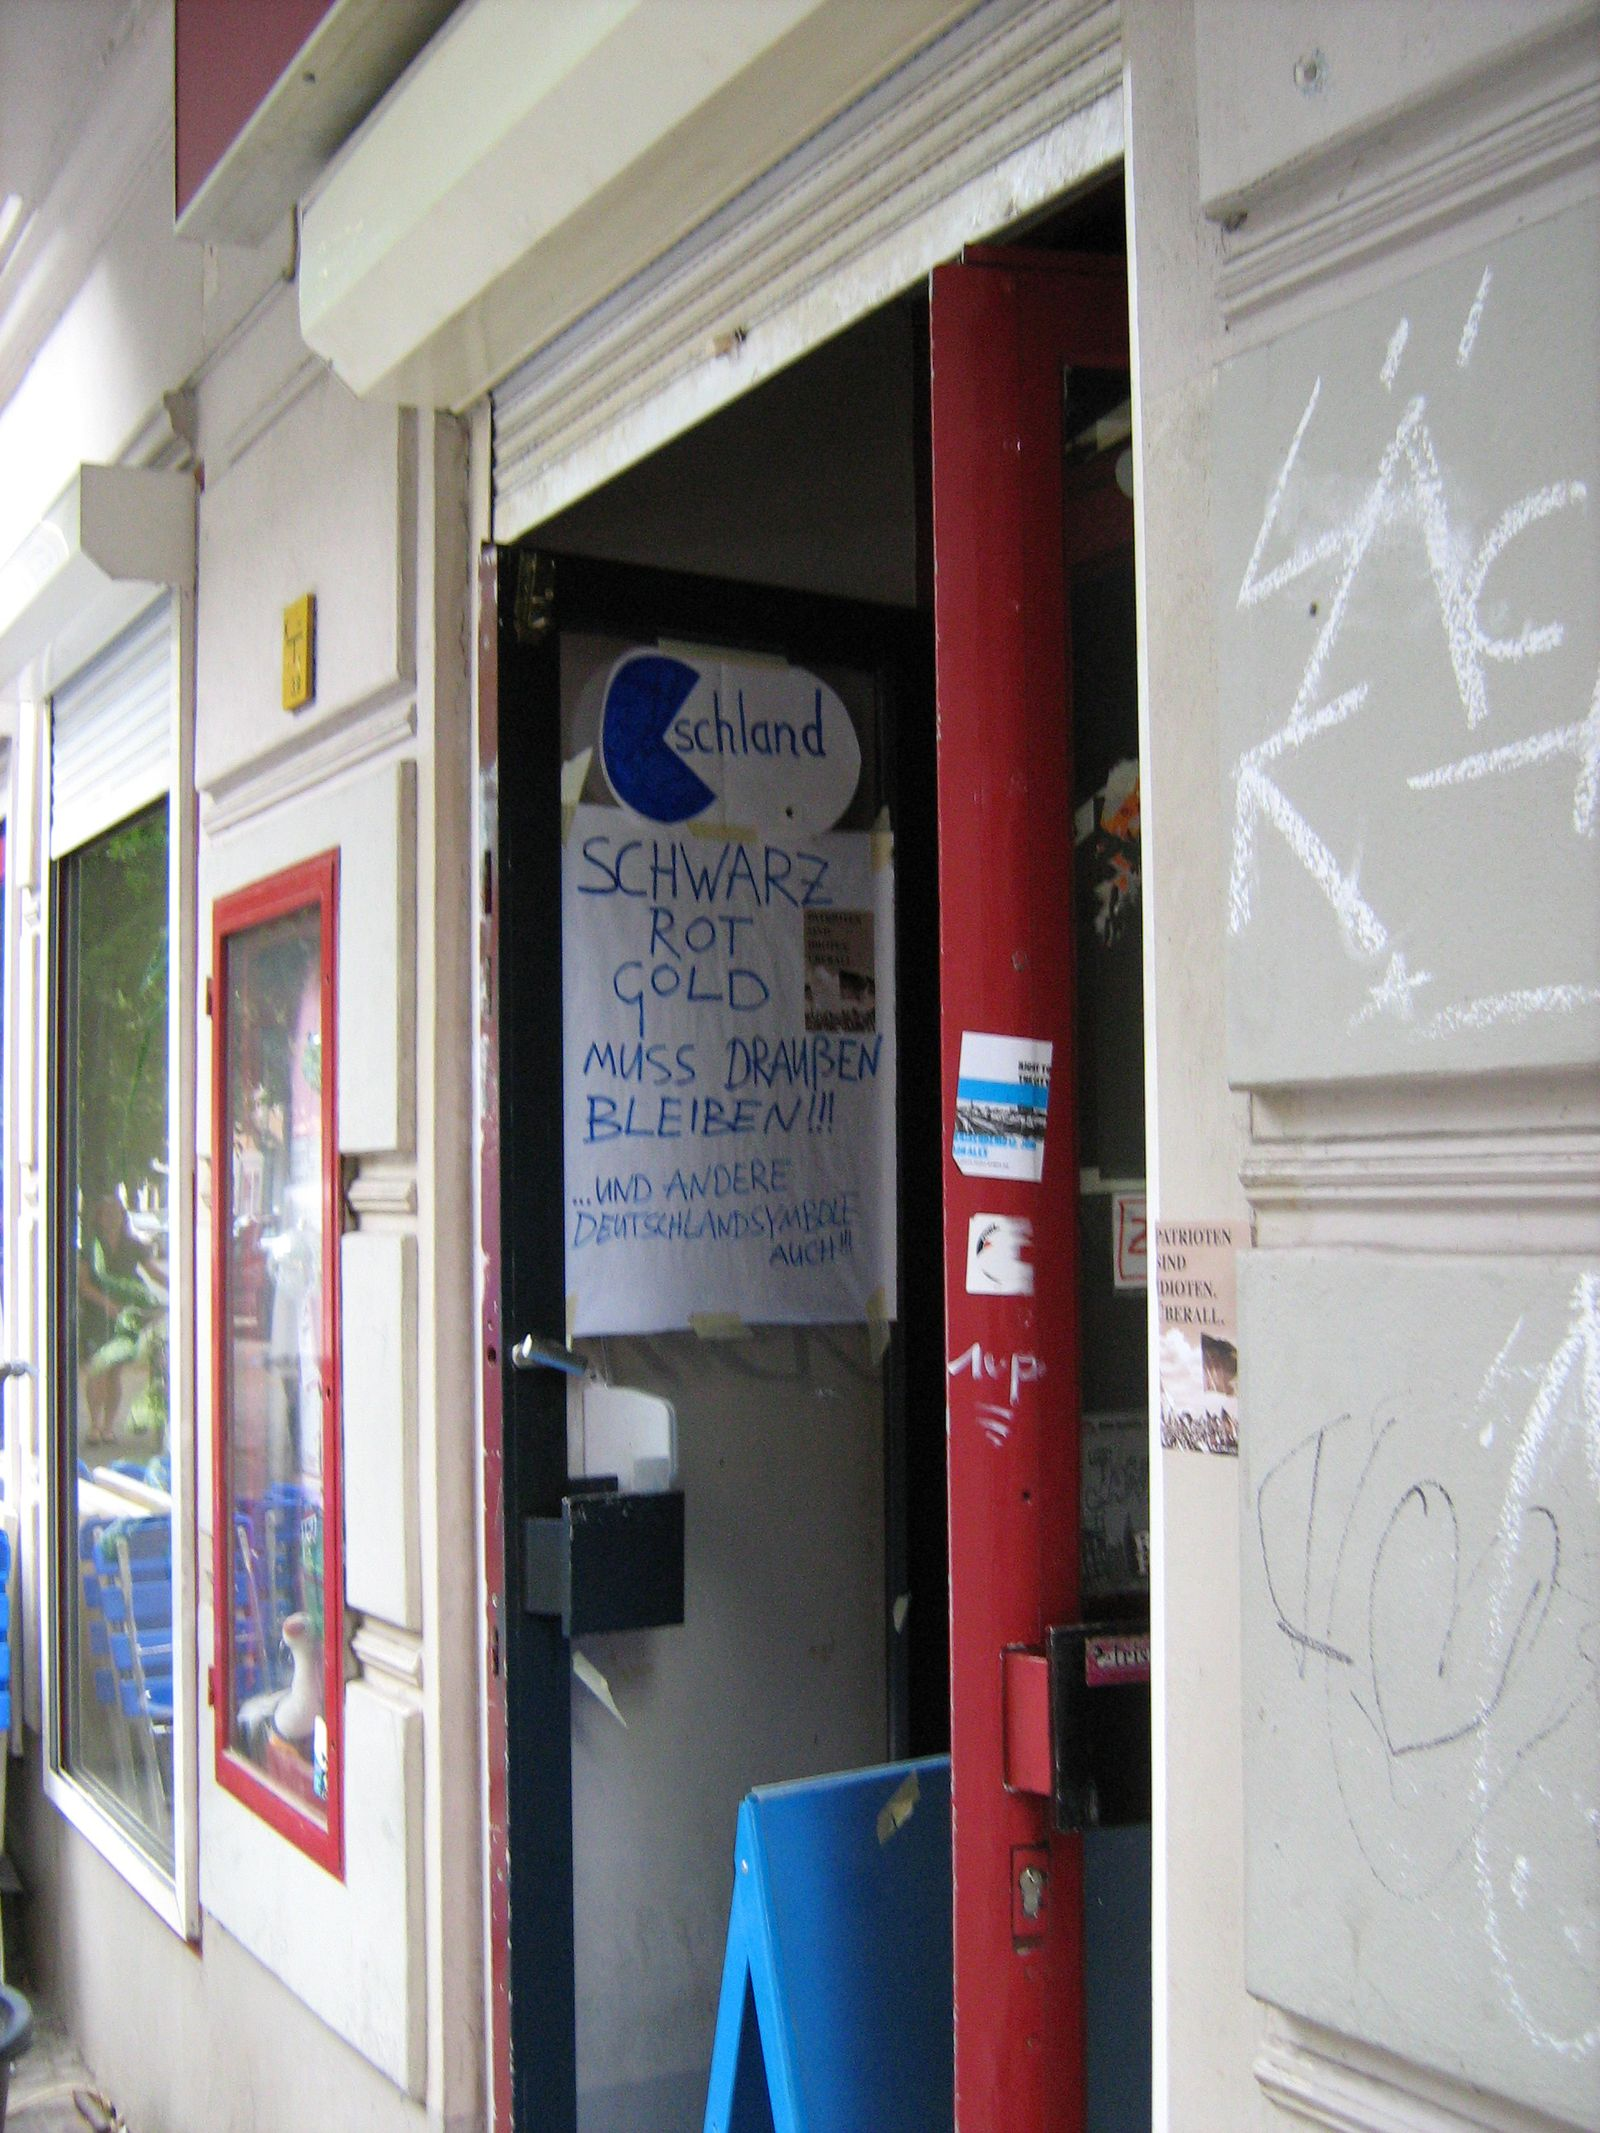 Berlin / Neukölln / Migranten / Deutschlandsymbole